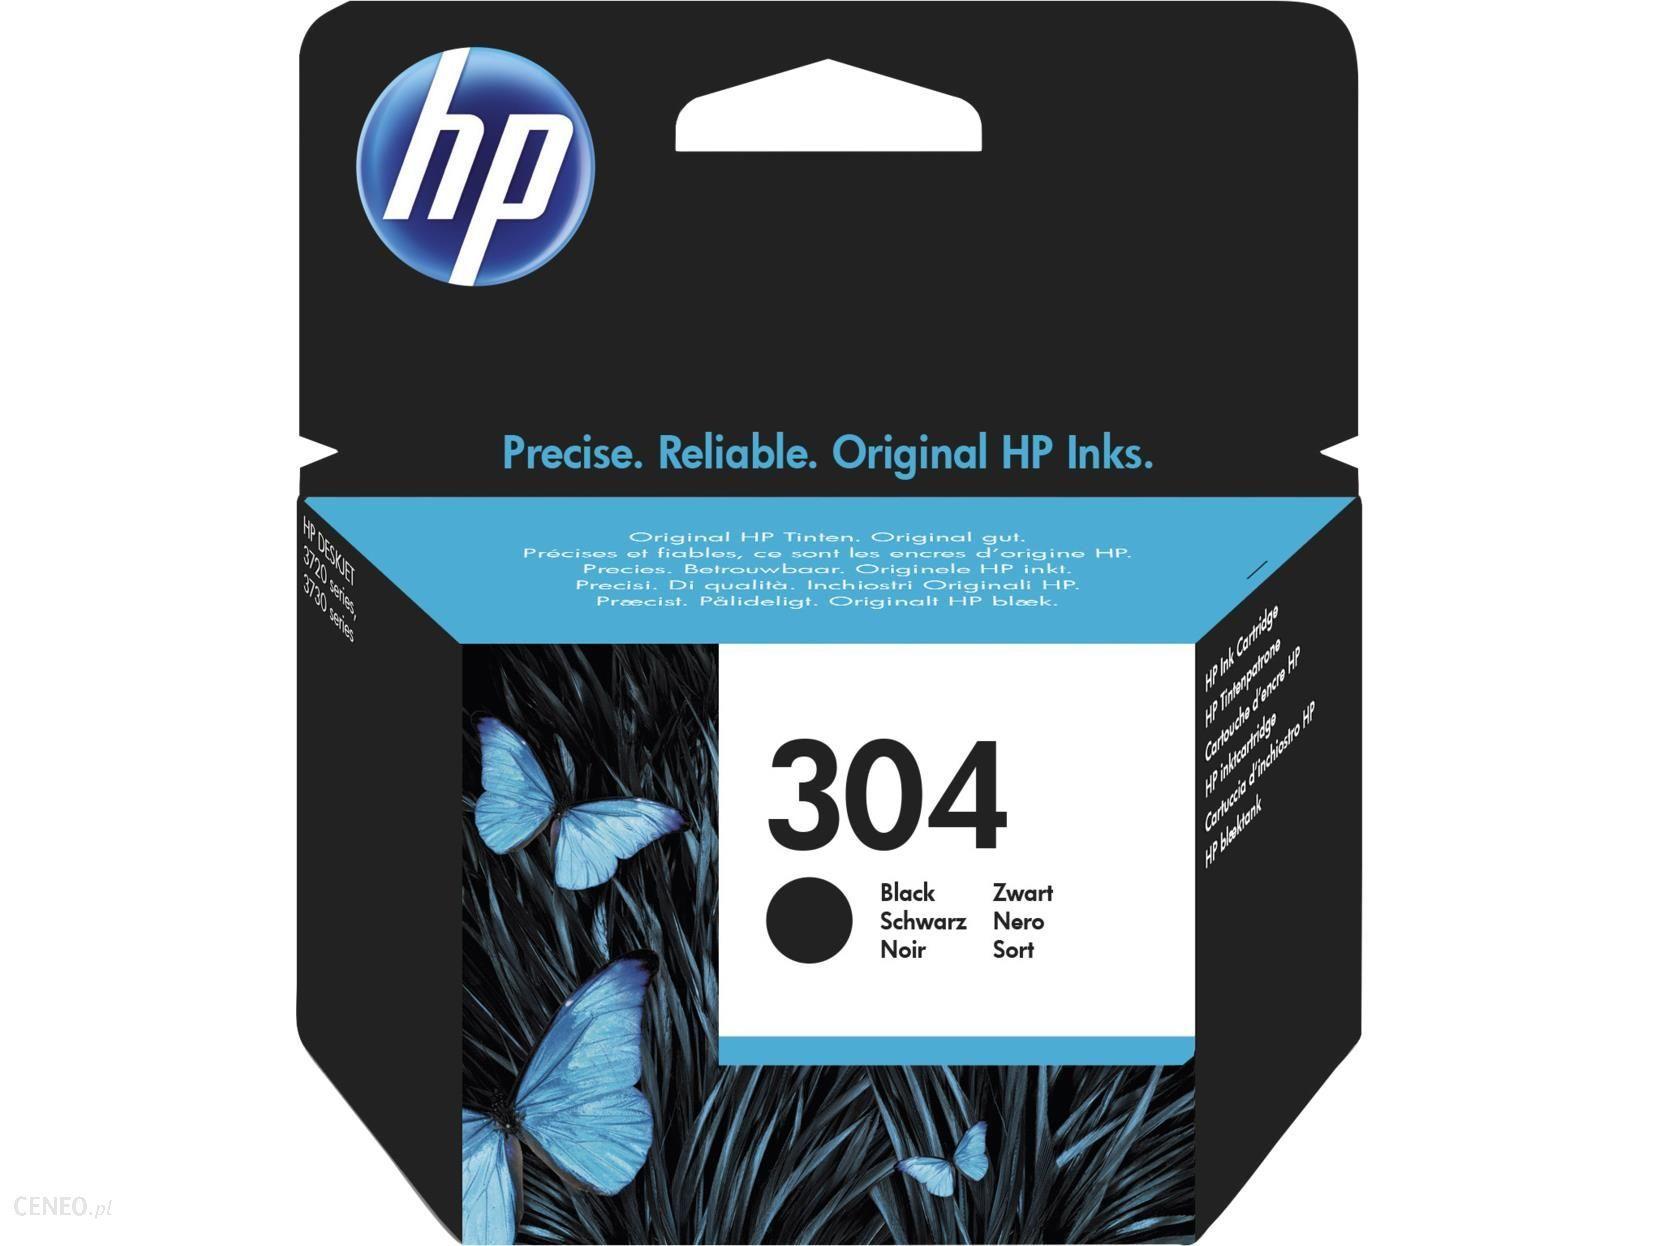 Tusz HP 304 Deskjet Ink czarny, oryginalny